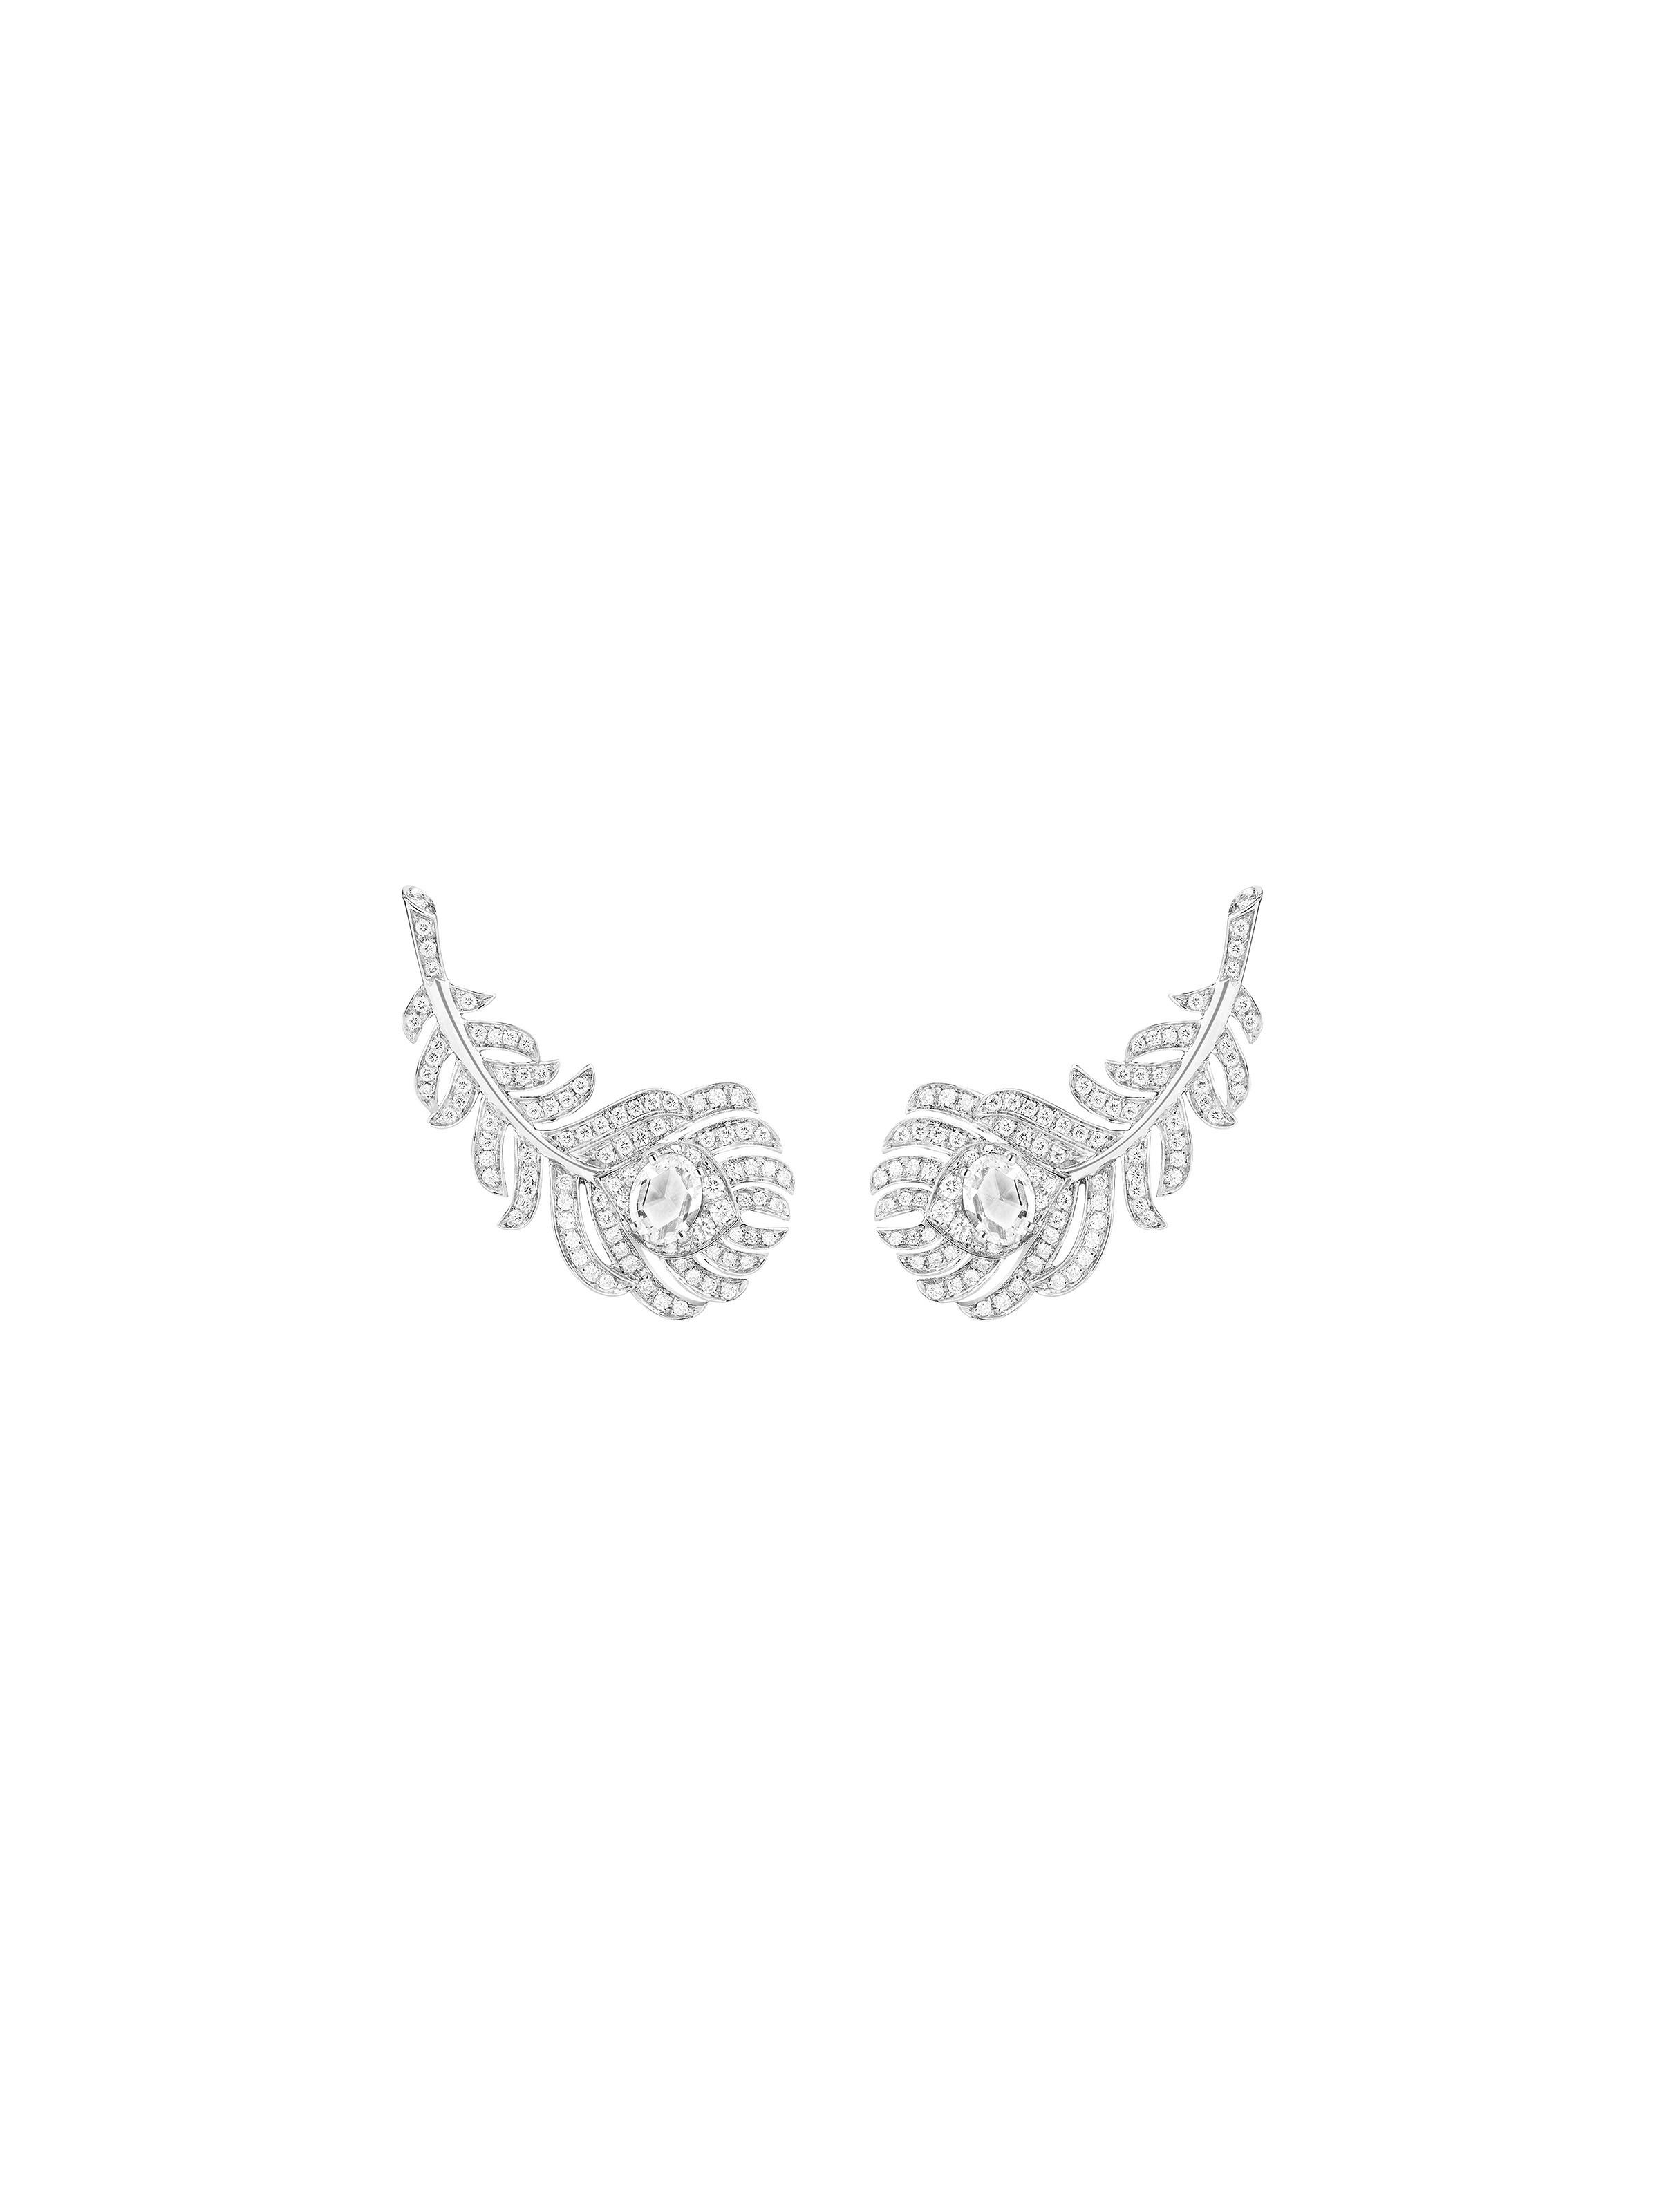 Nature Triomphante earrings